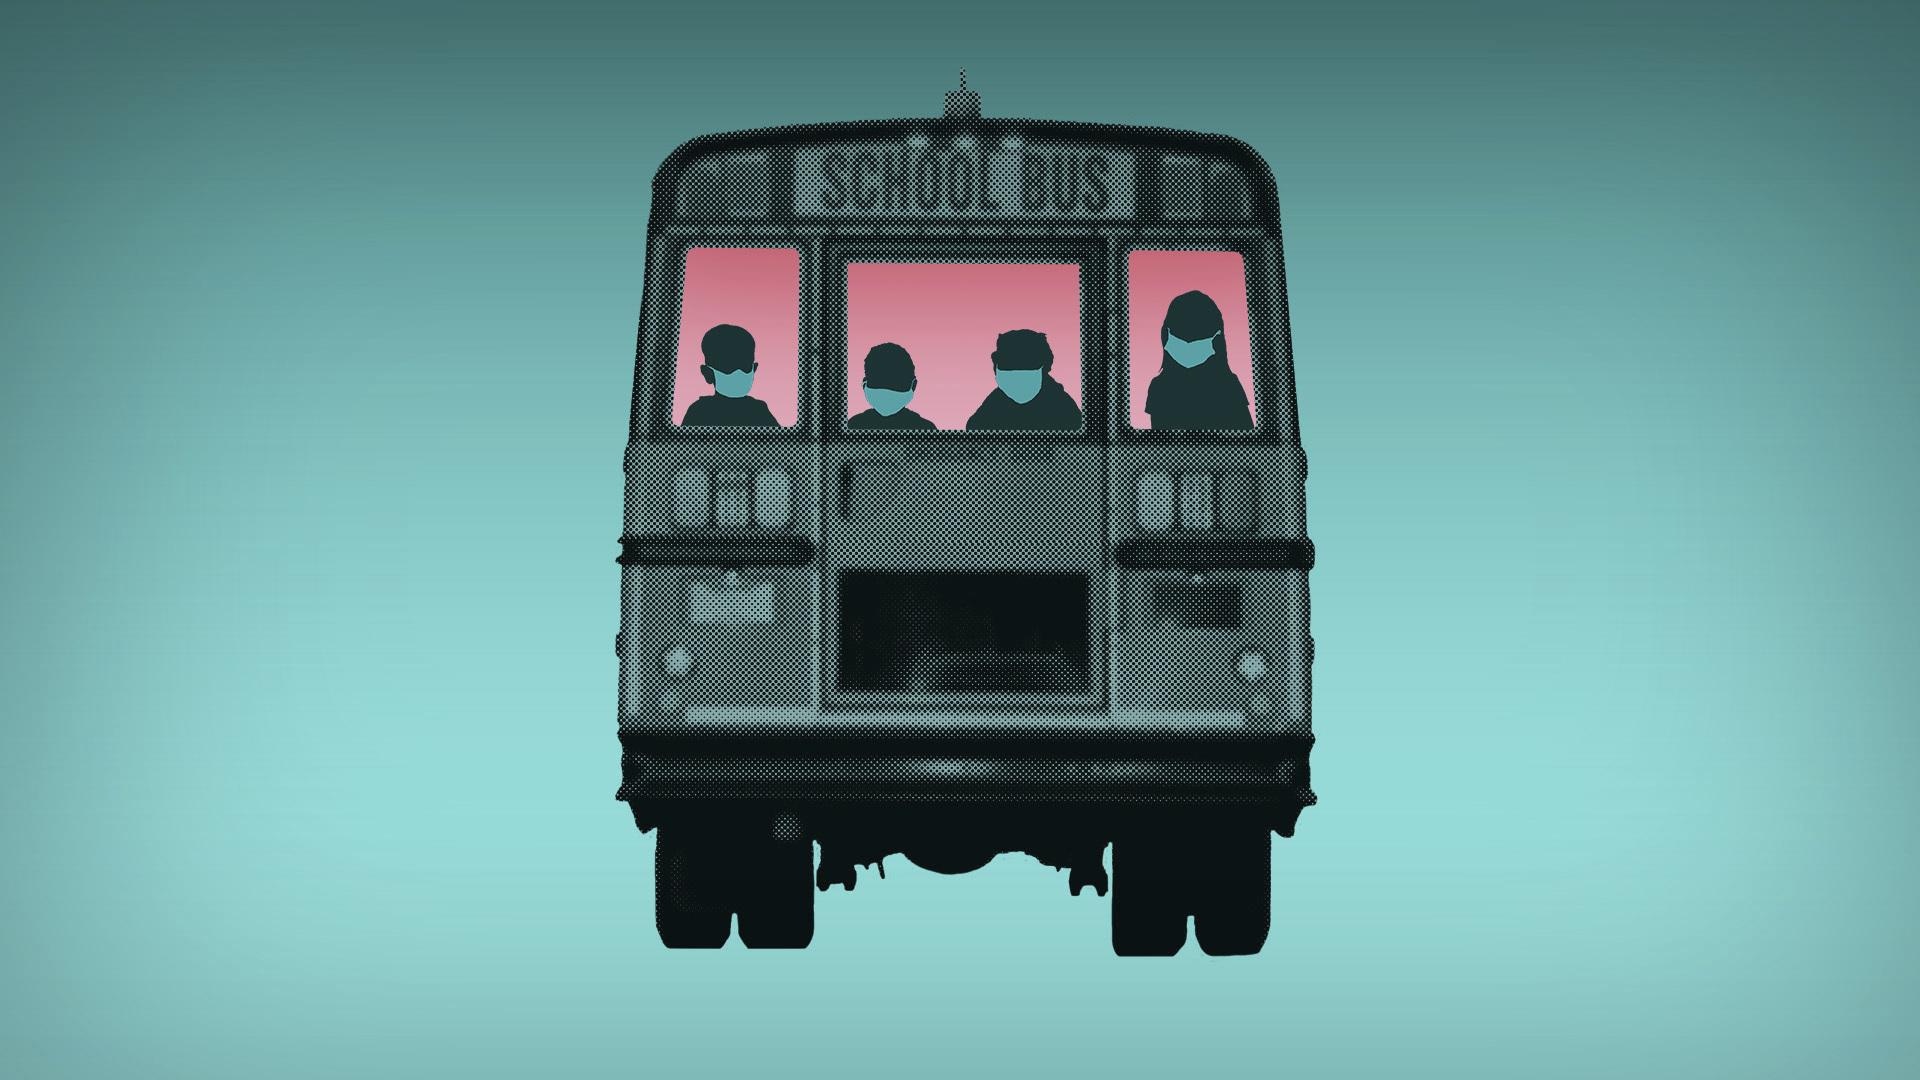 VIRUS OUTBREAK VIRAL QUESTIONS SCHOOLS